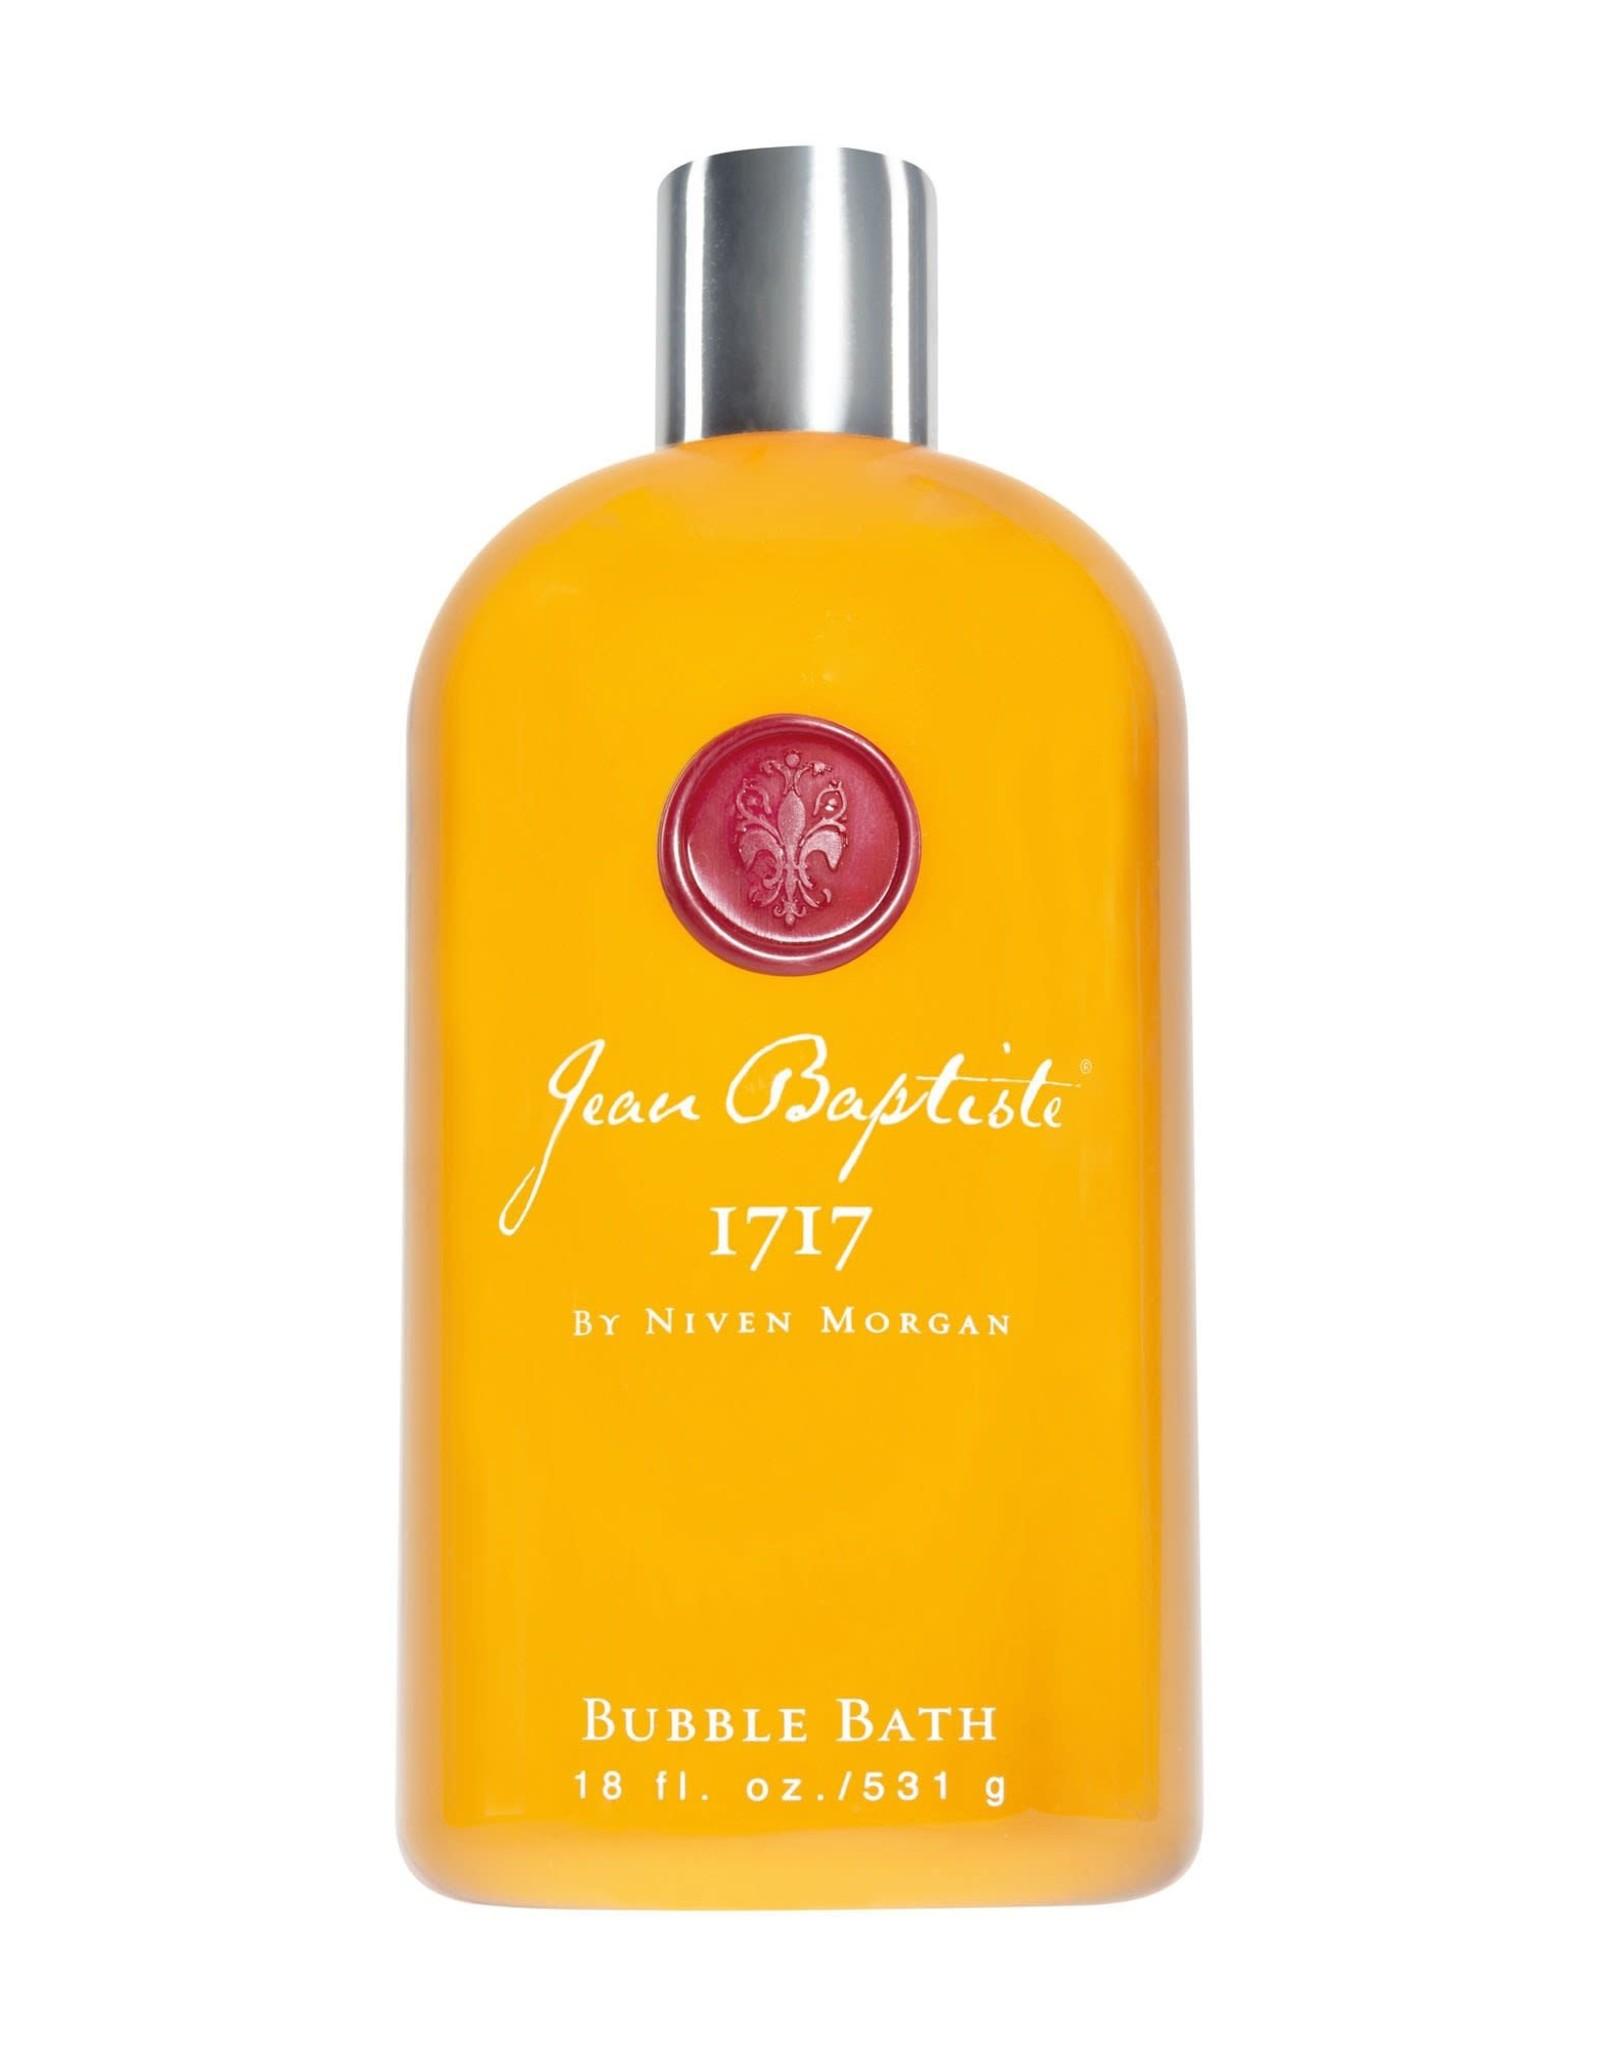 NM Jean Baptiste 1717 Bubble Bath